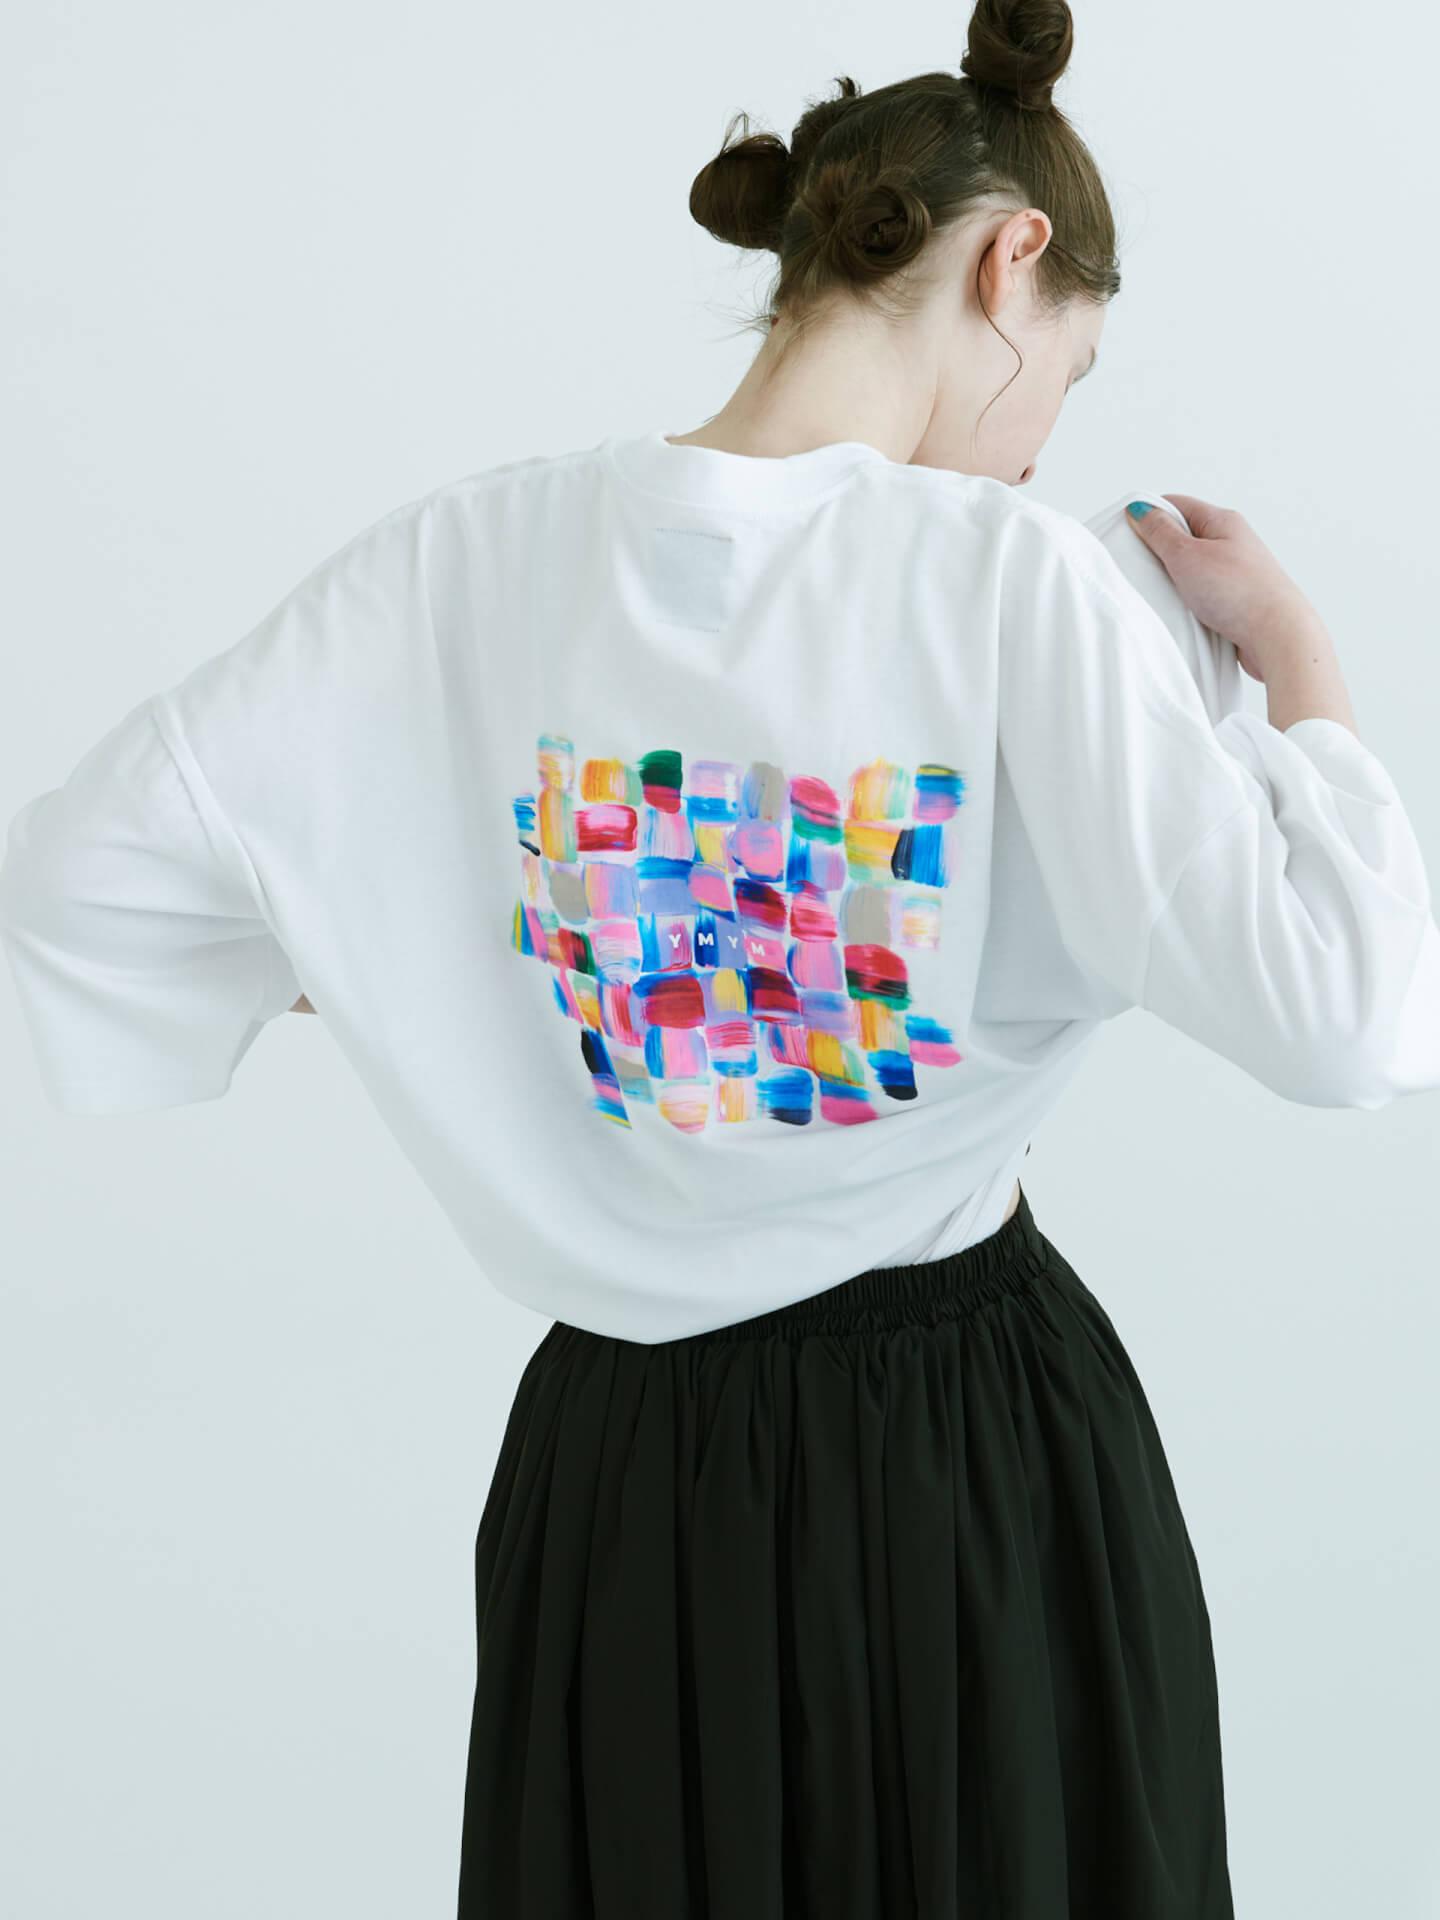 CHAIのベーシスト・YUUKIによるプロジェクト「YMYM」よりファッションブランドオープン!2021年春夏コレクション&描き下ろし絵画などの展示会も life210405_ymym_9